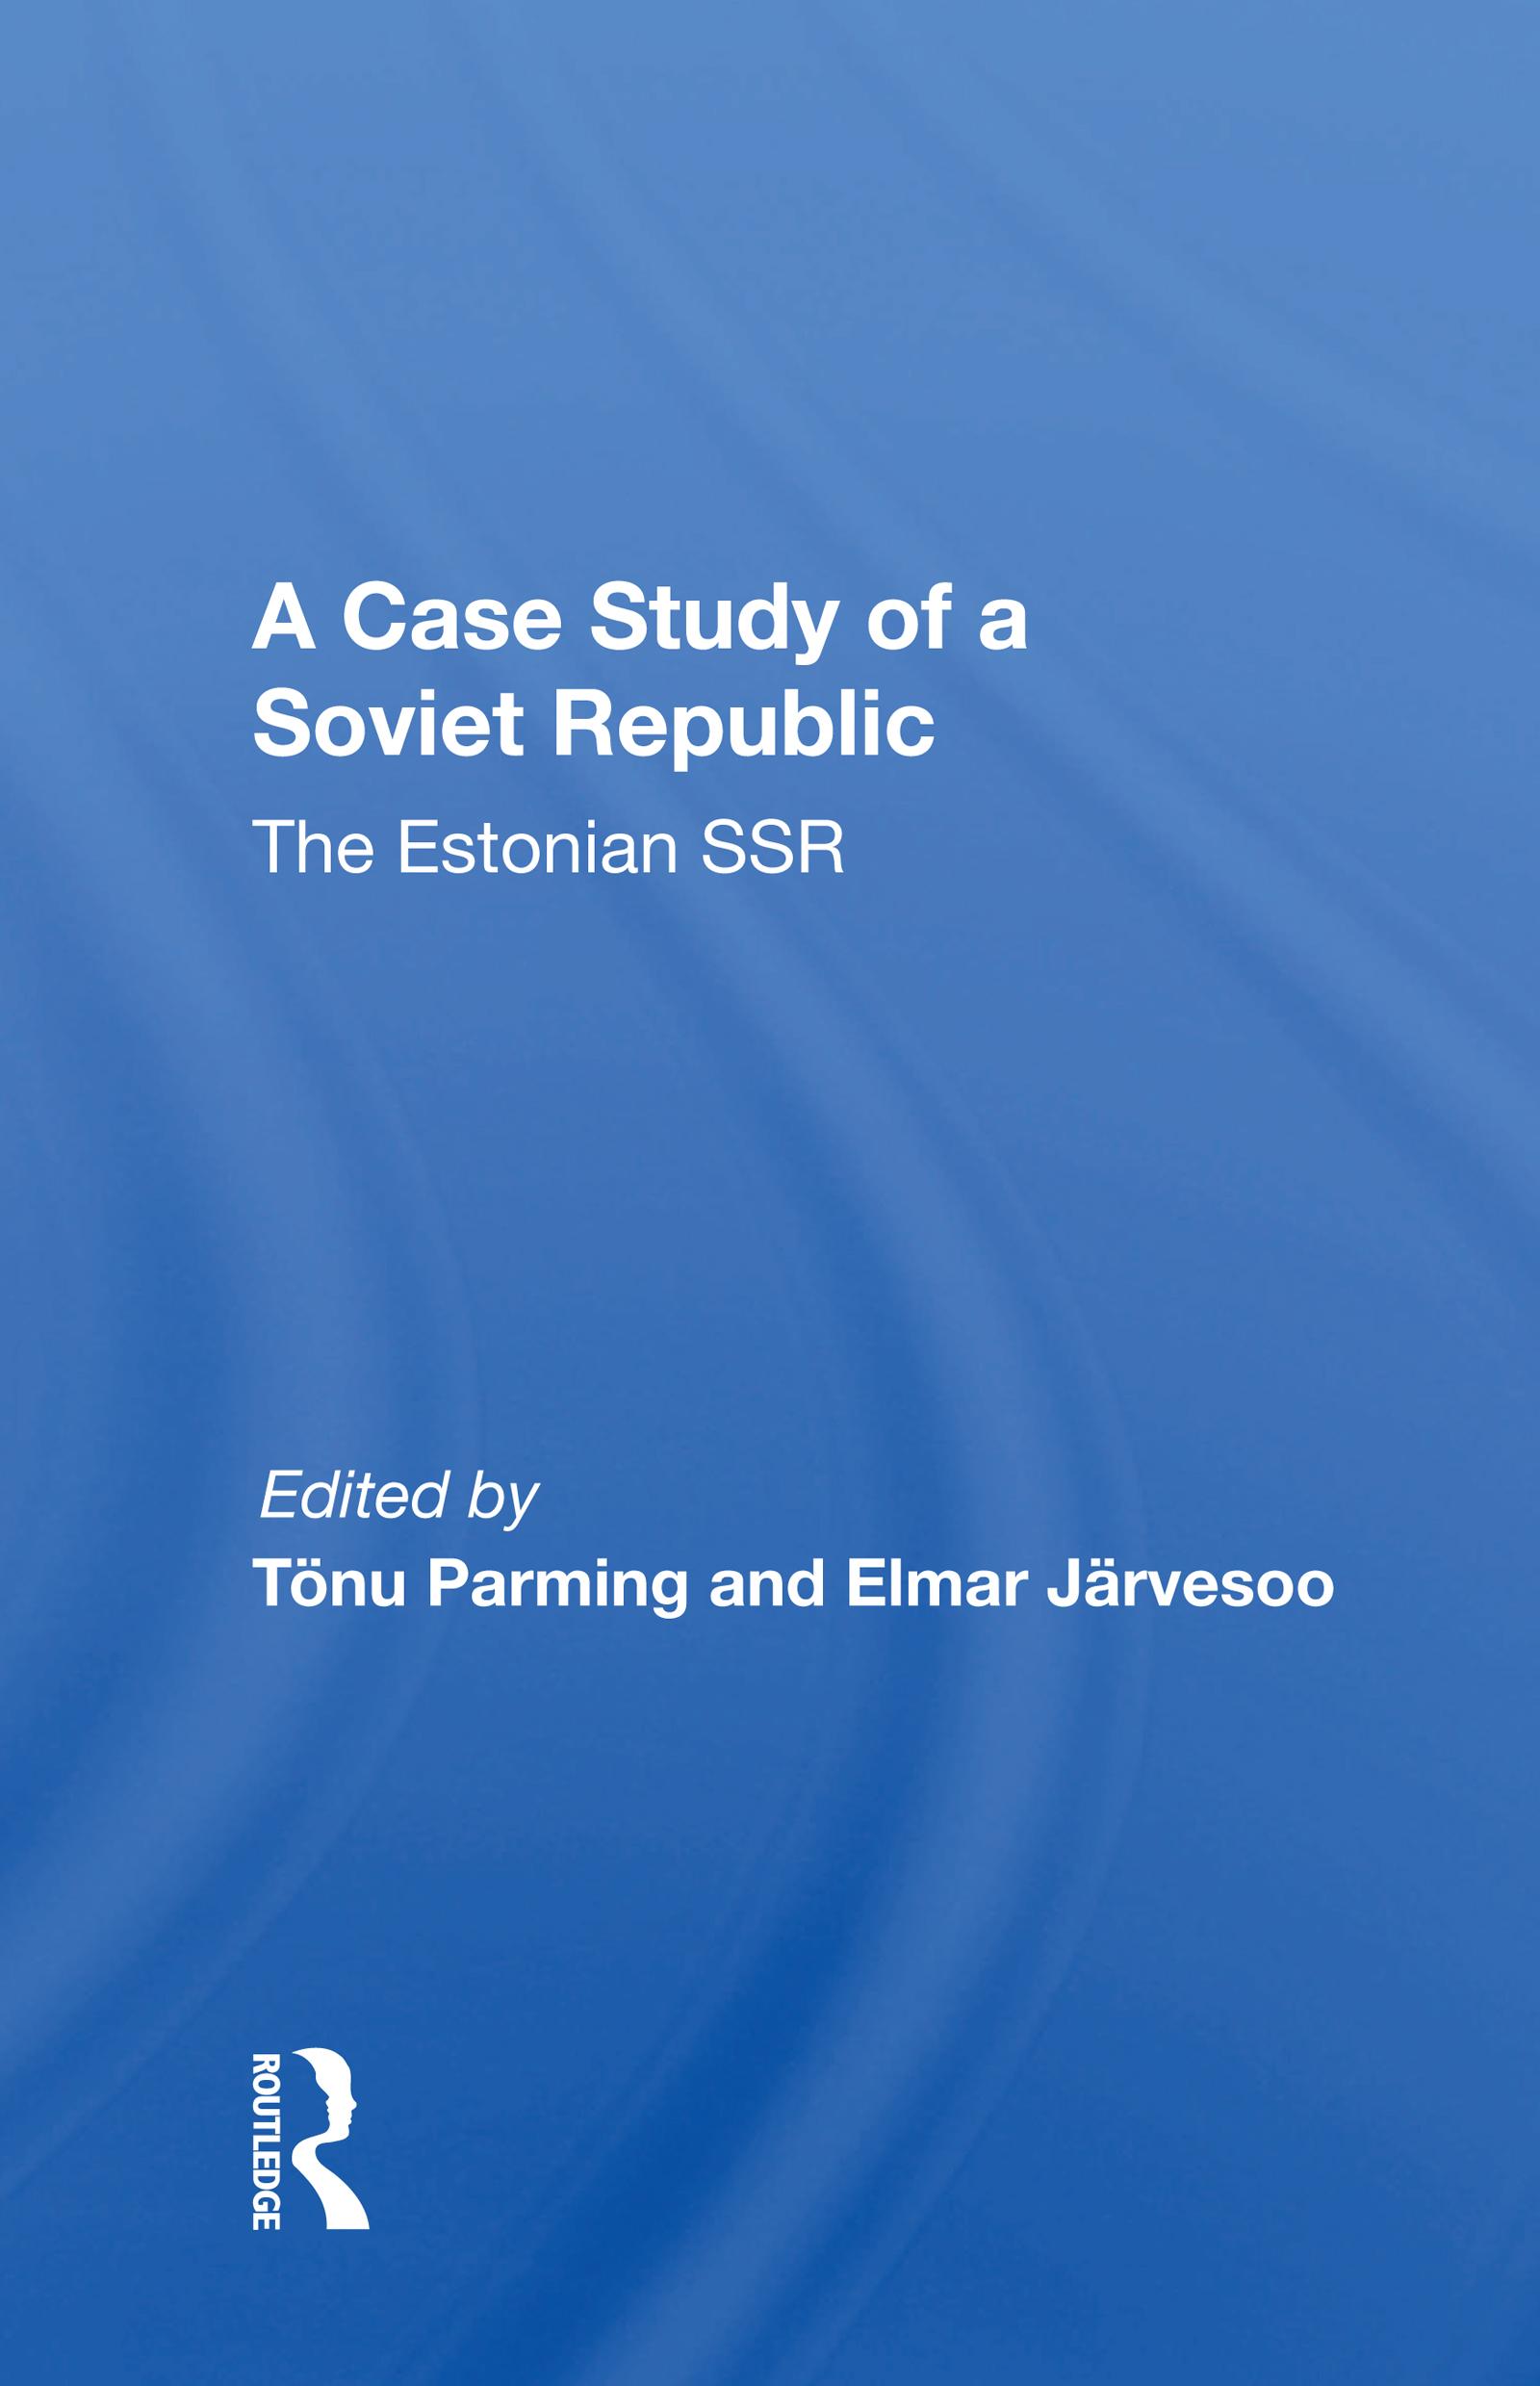 A Case Study of a Soviet Republic